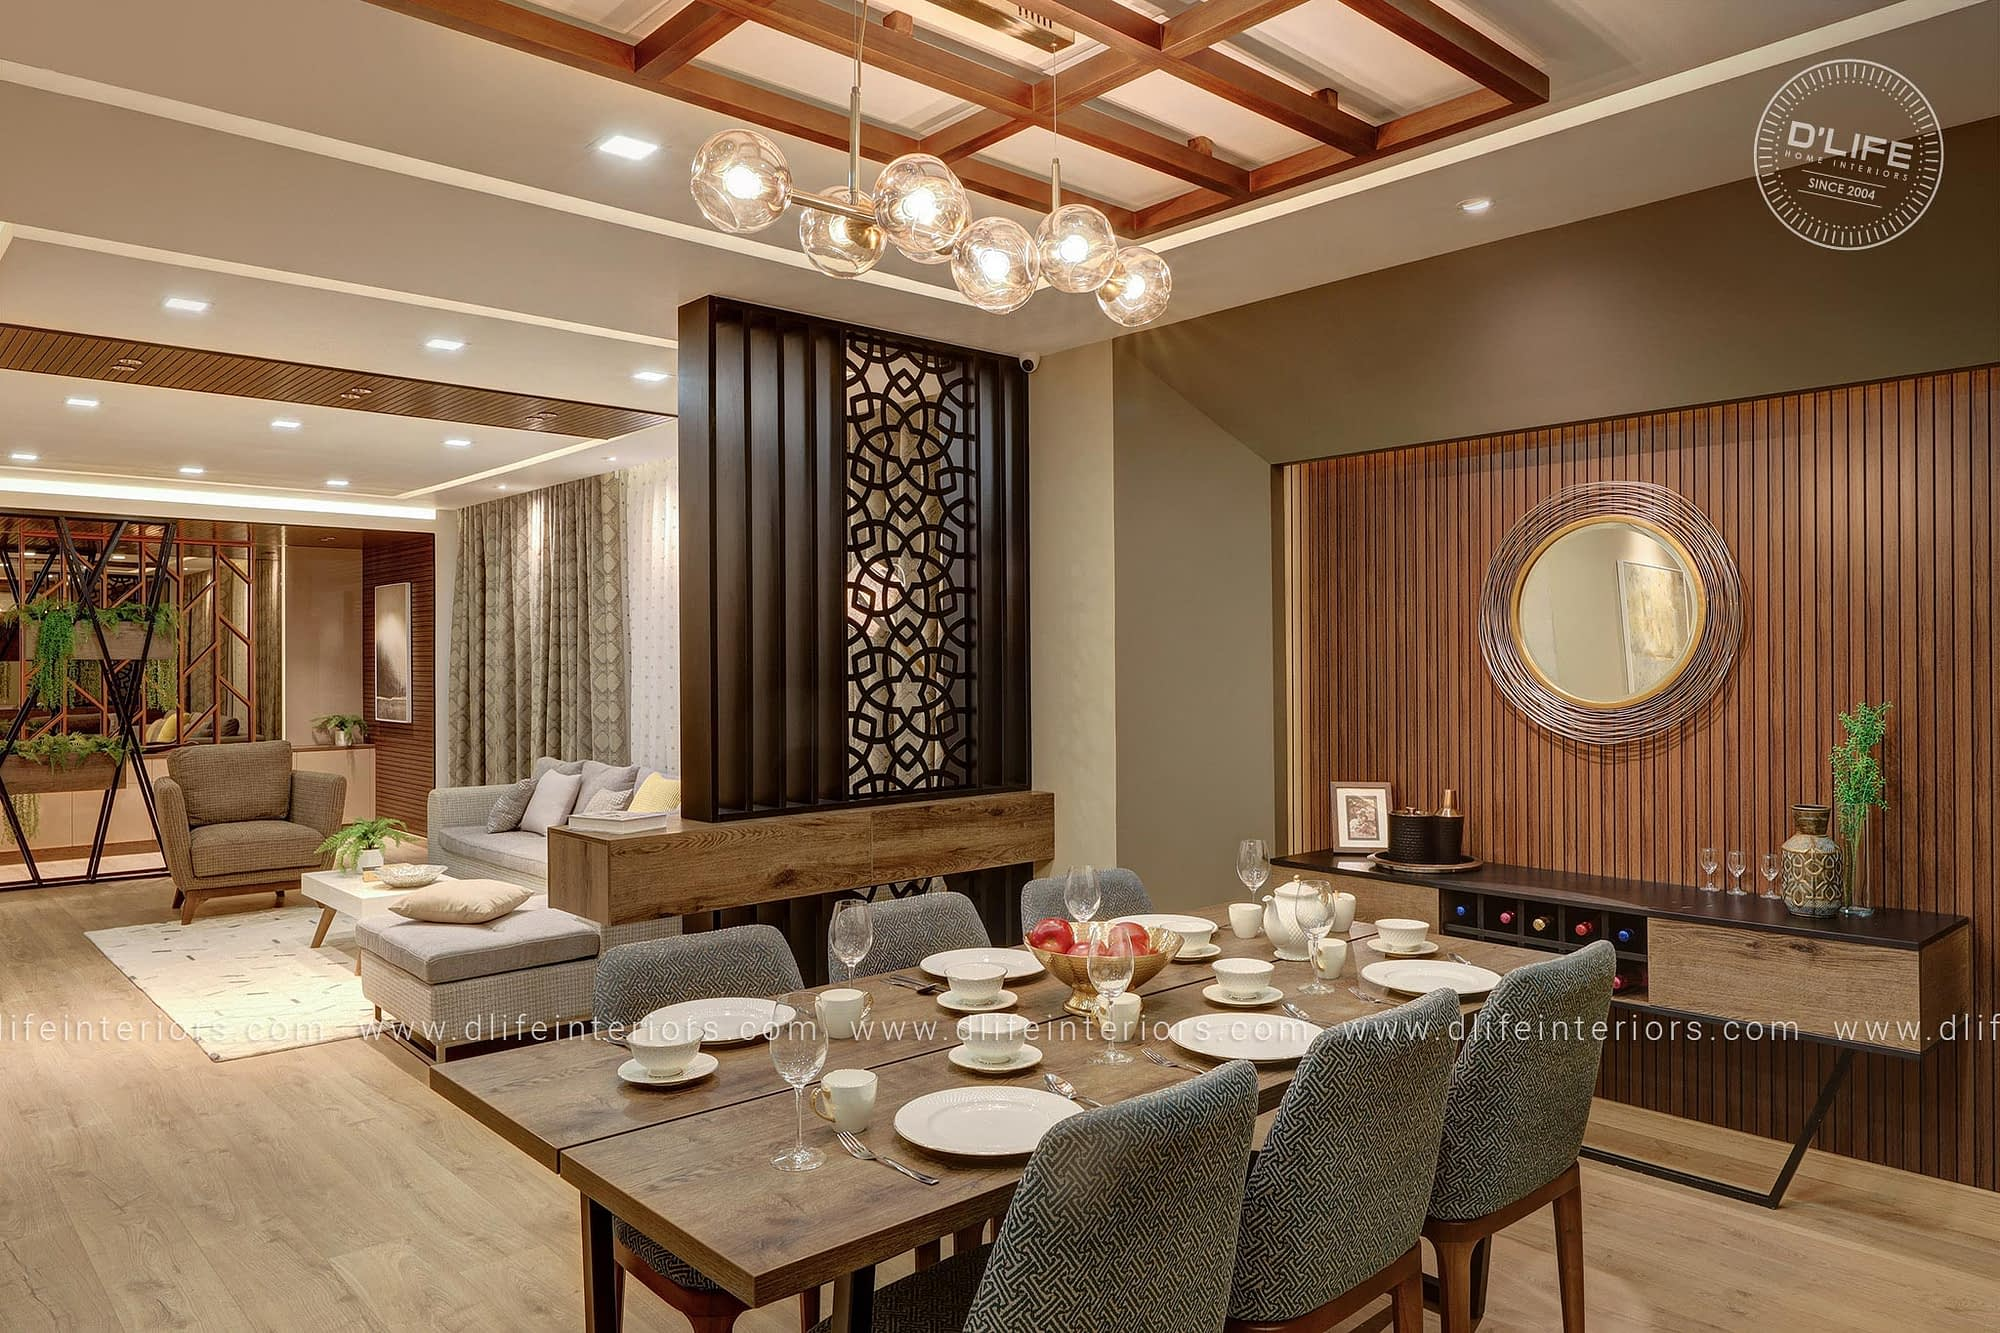 trendy-dining-room-design-kerala